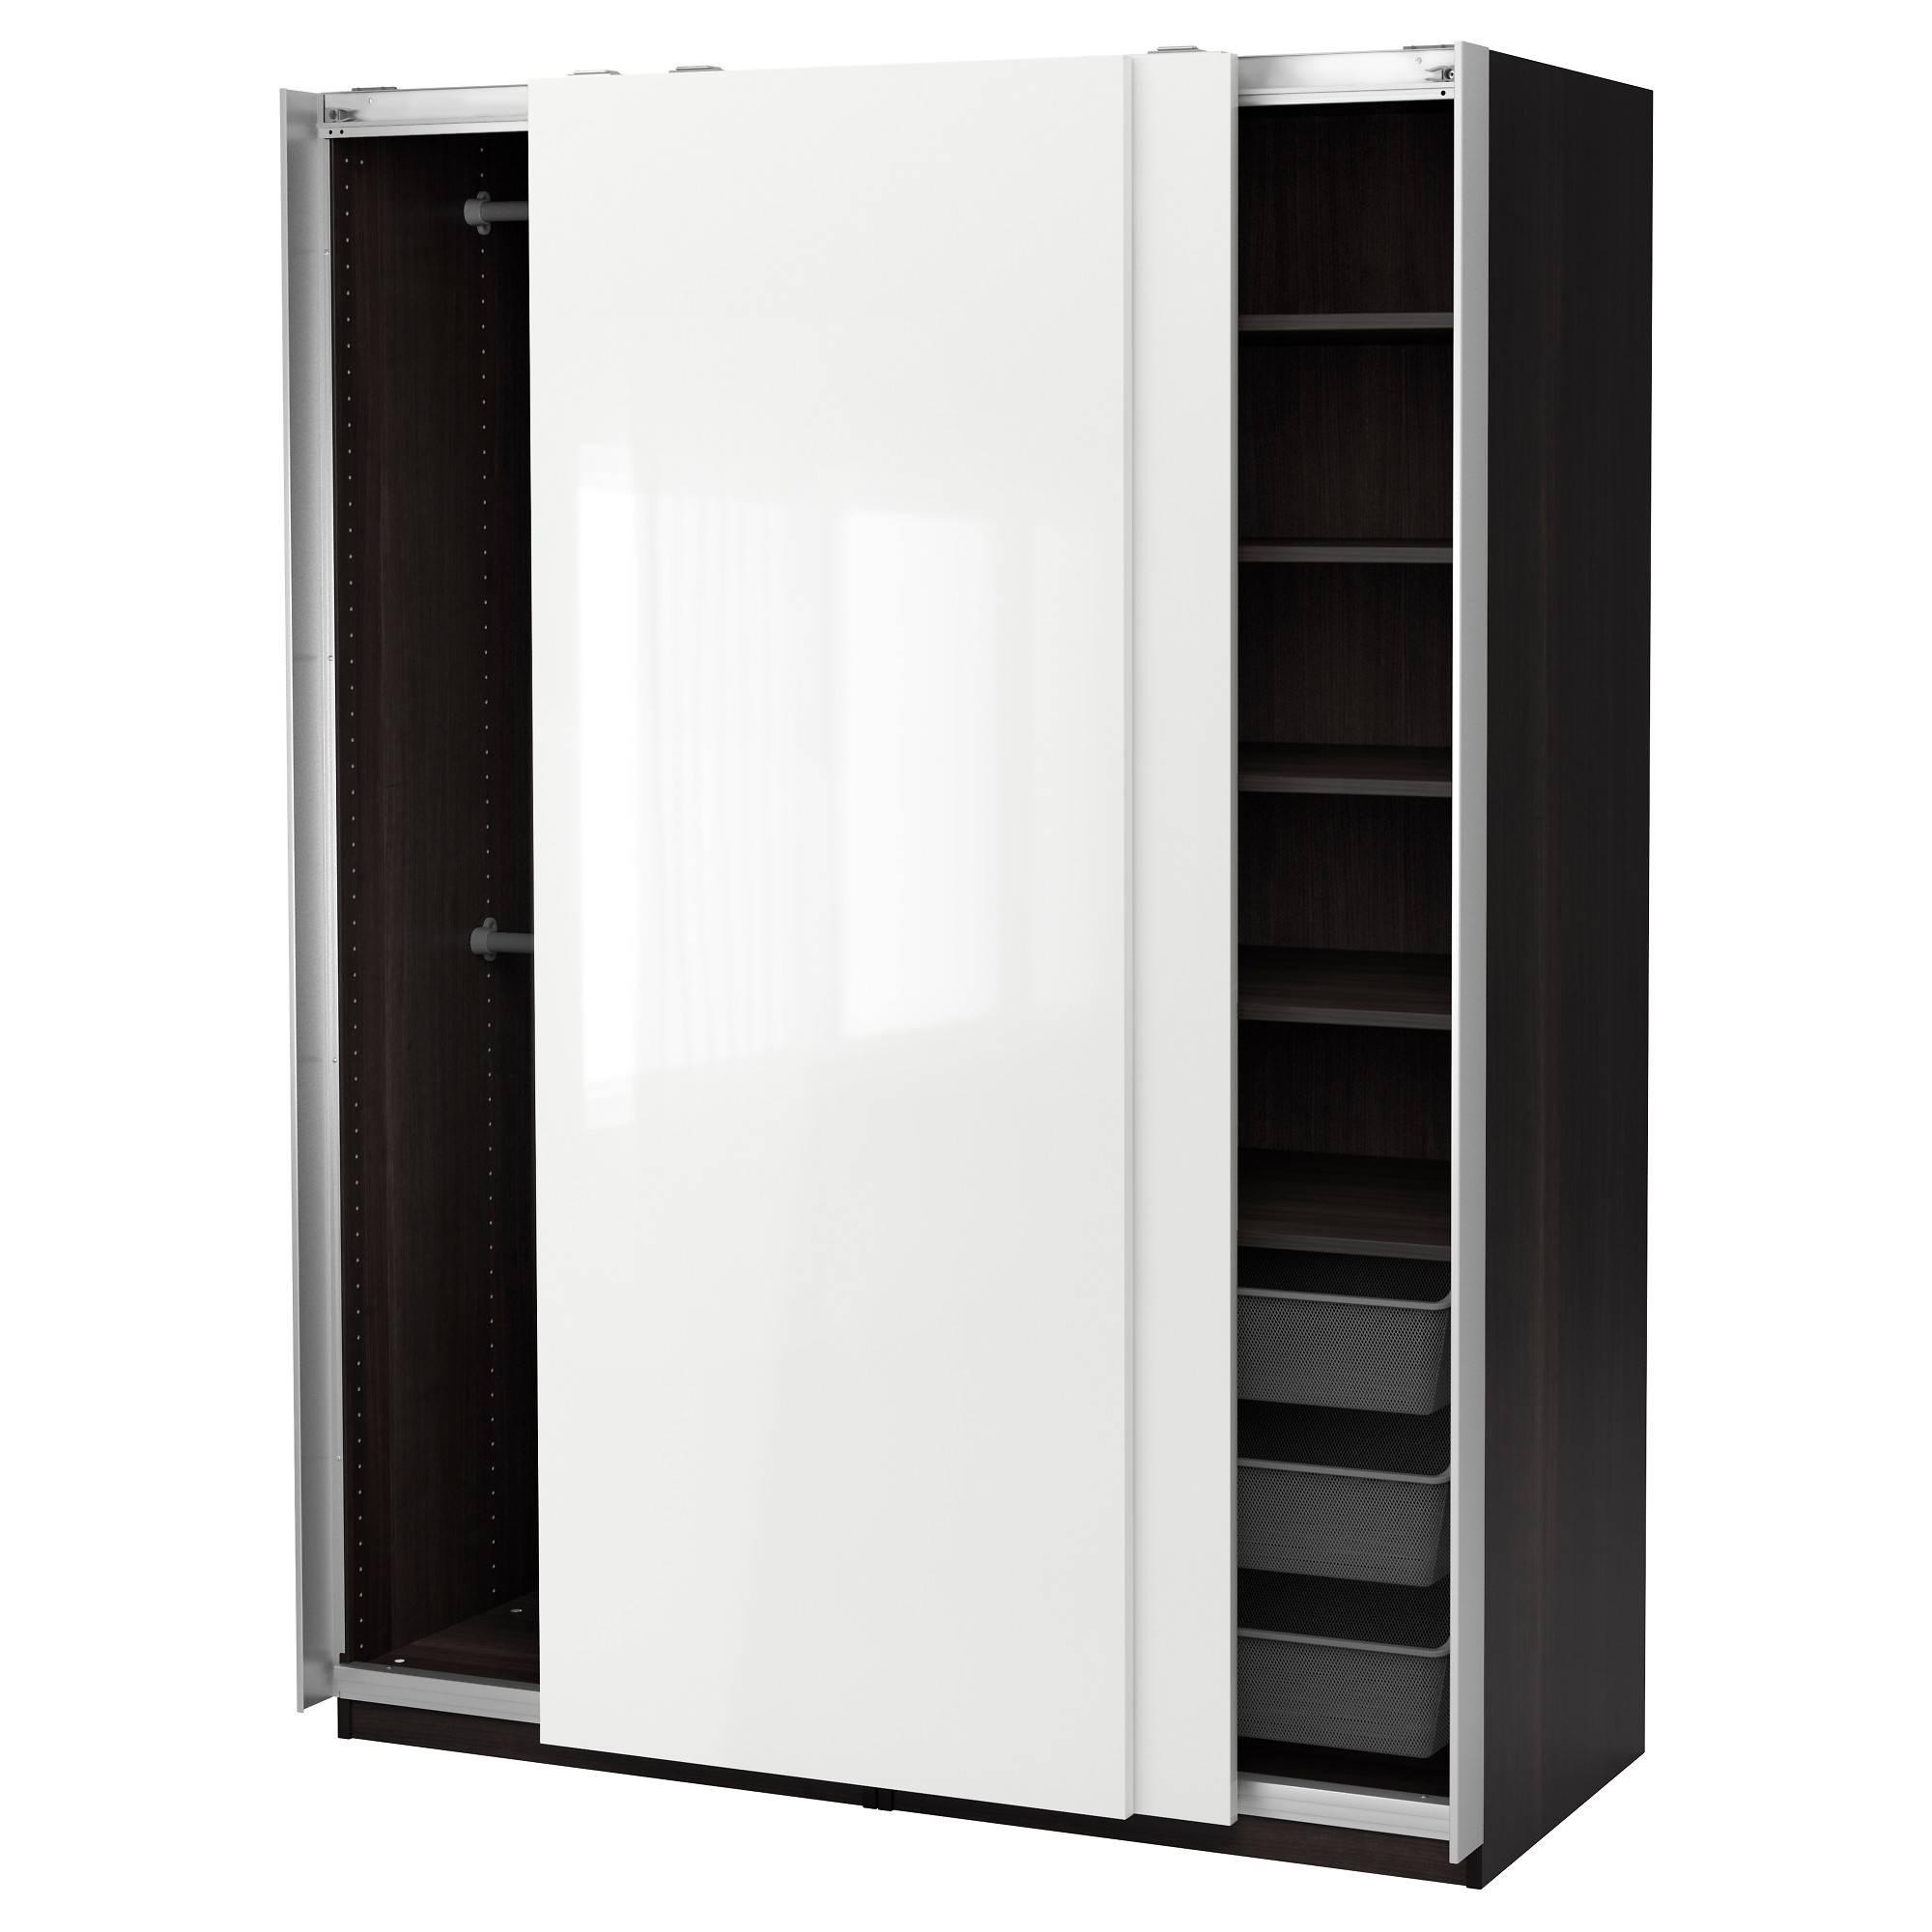 Pax Wardrobe Black-Brown/hasvik High-Gloss/white 150X66X201 Cm - Ikea throughout Black Gloss Wardrobes (Image 14 of 15)